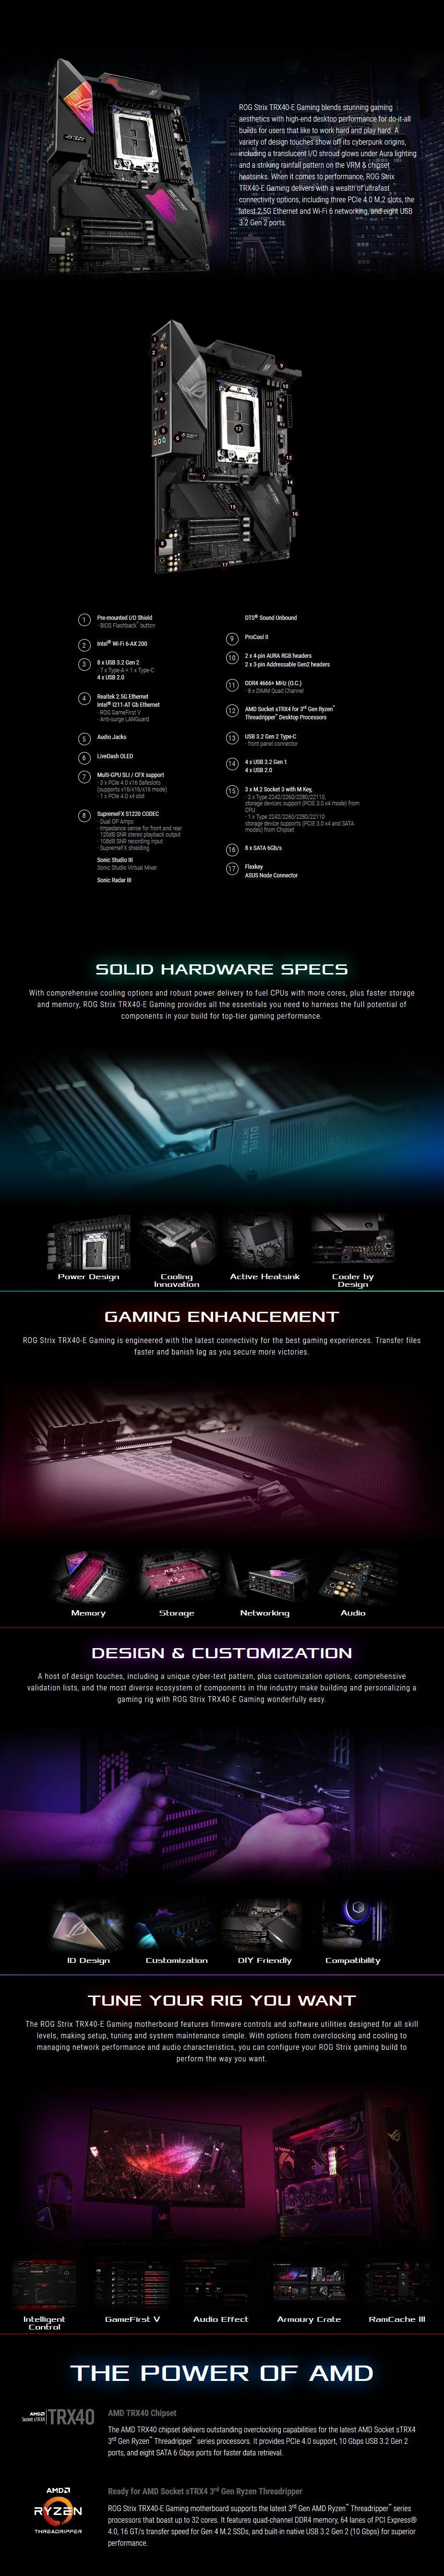 asus-rog-strix-trx40e-gaming-strx4-atx-motherboard-ac29700-9-1-.jpg